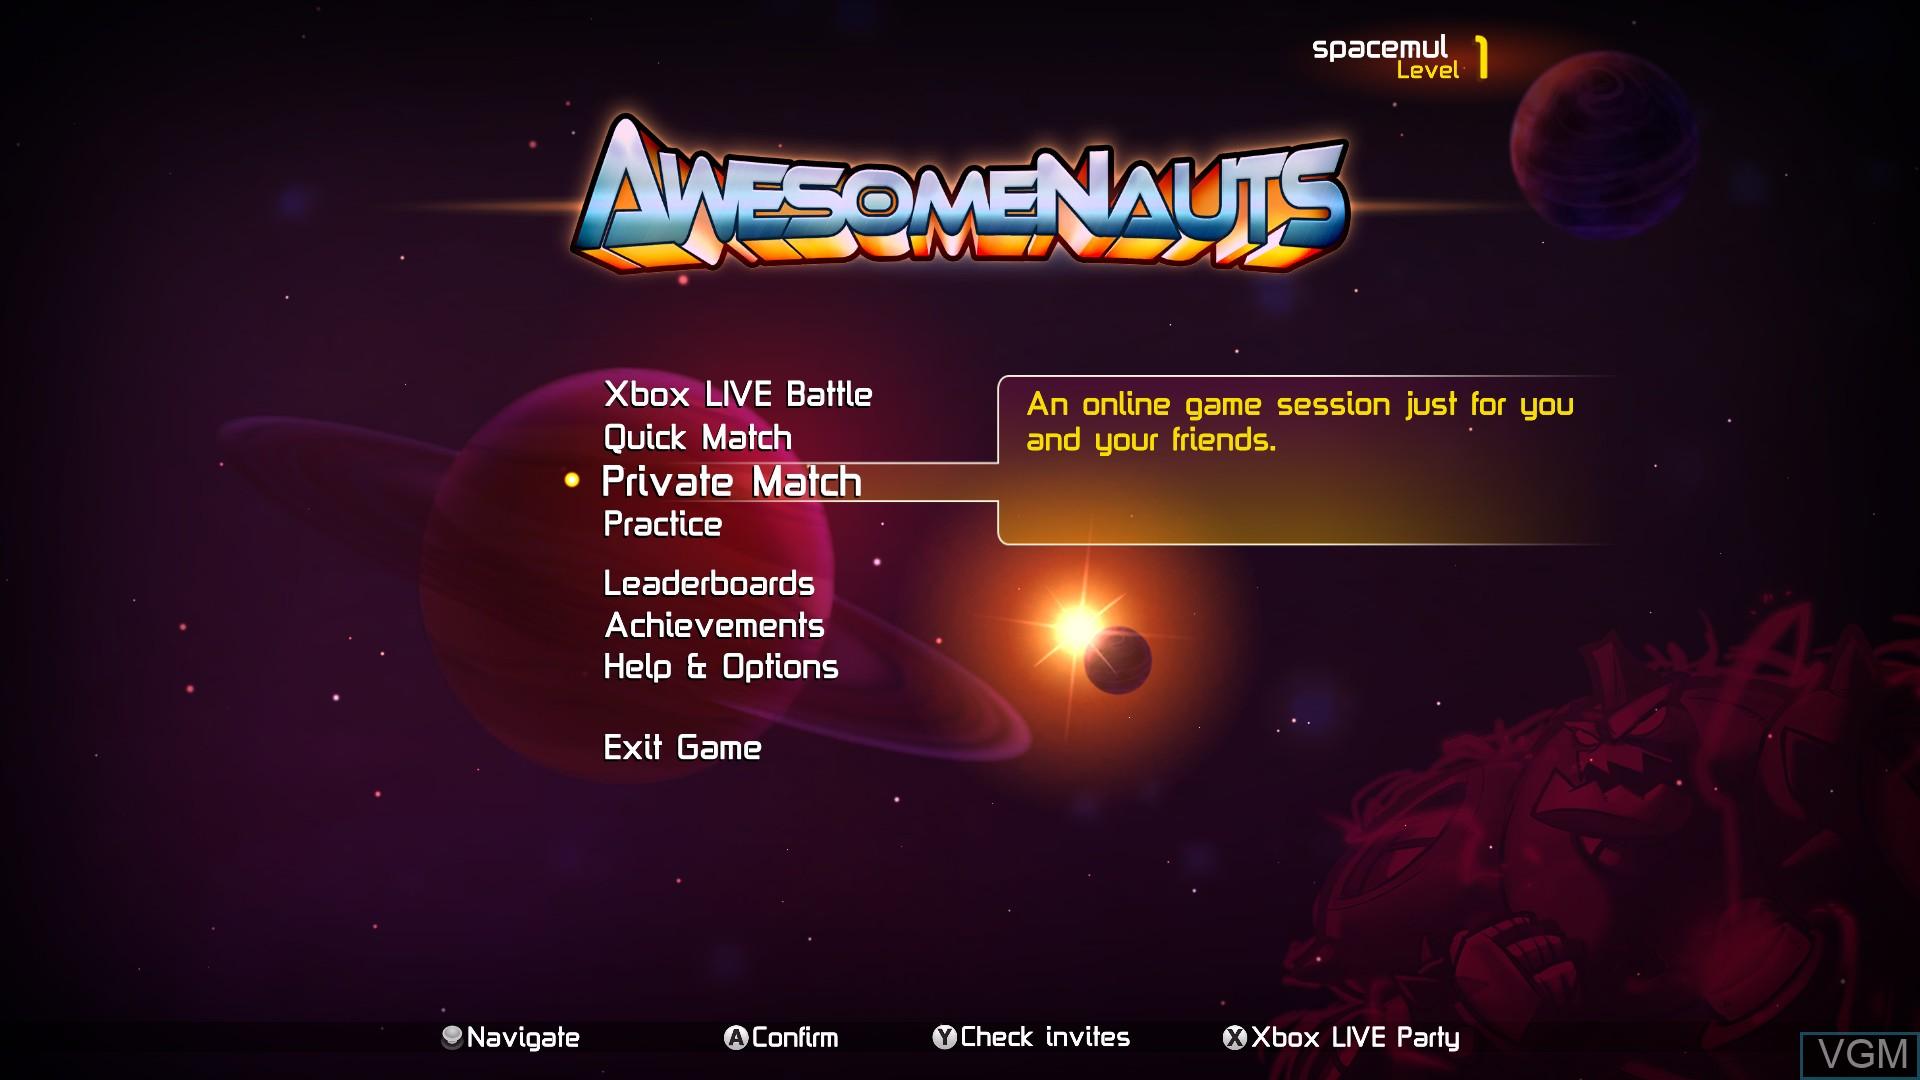 Image du menu du jeu Awesomenauts sur Microsoft Xbox 360